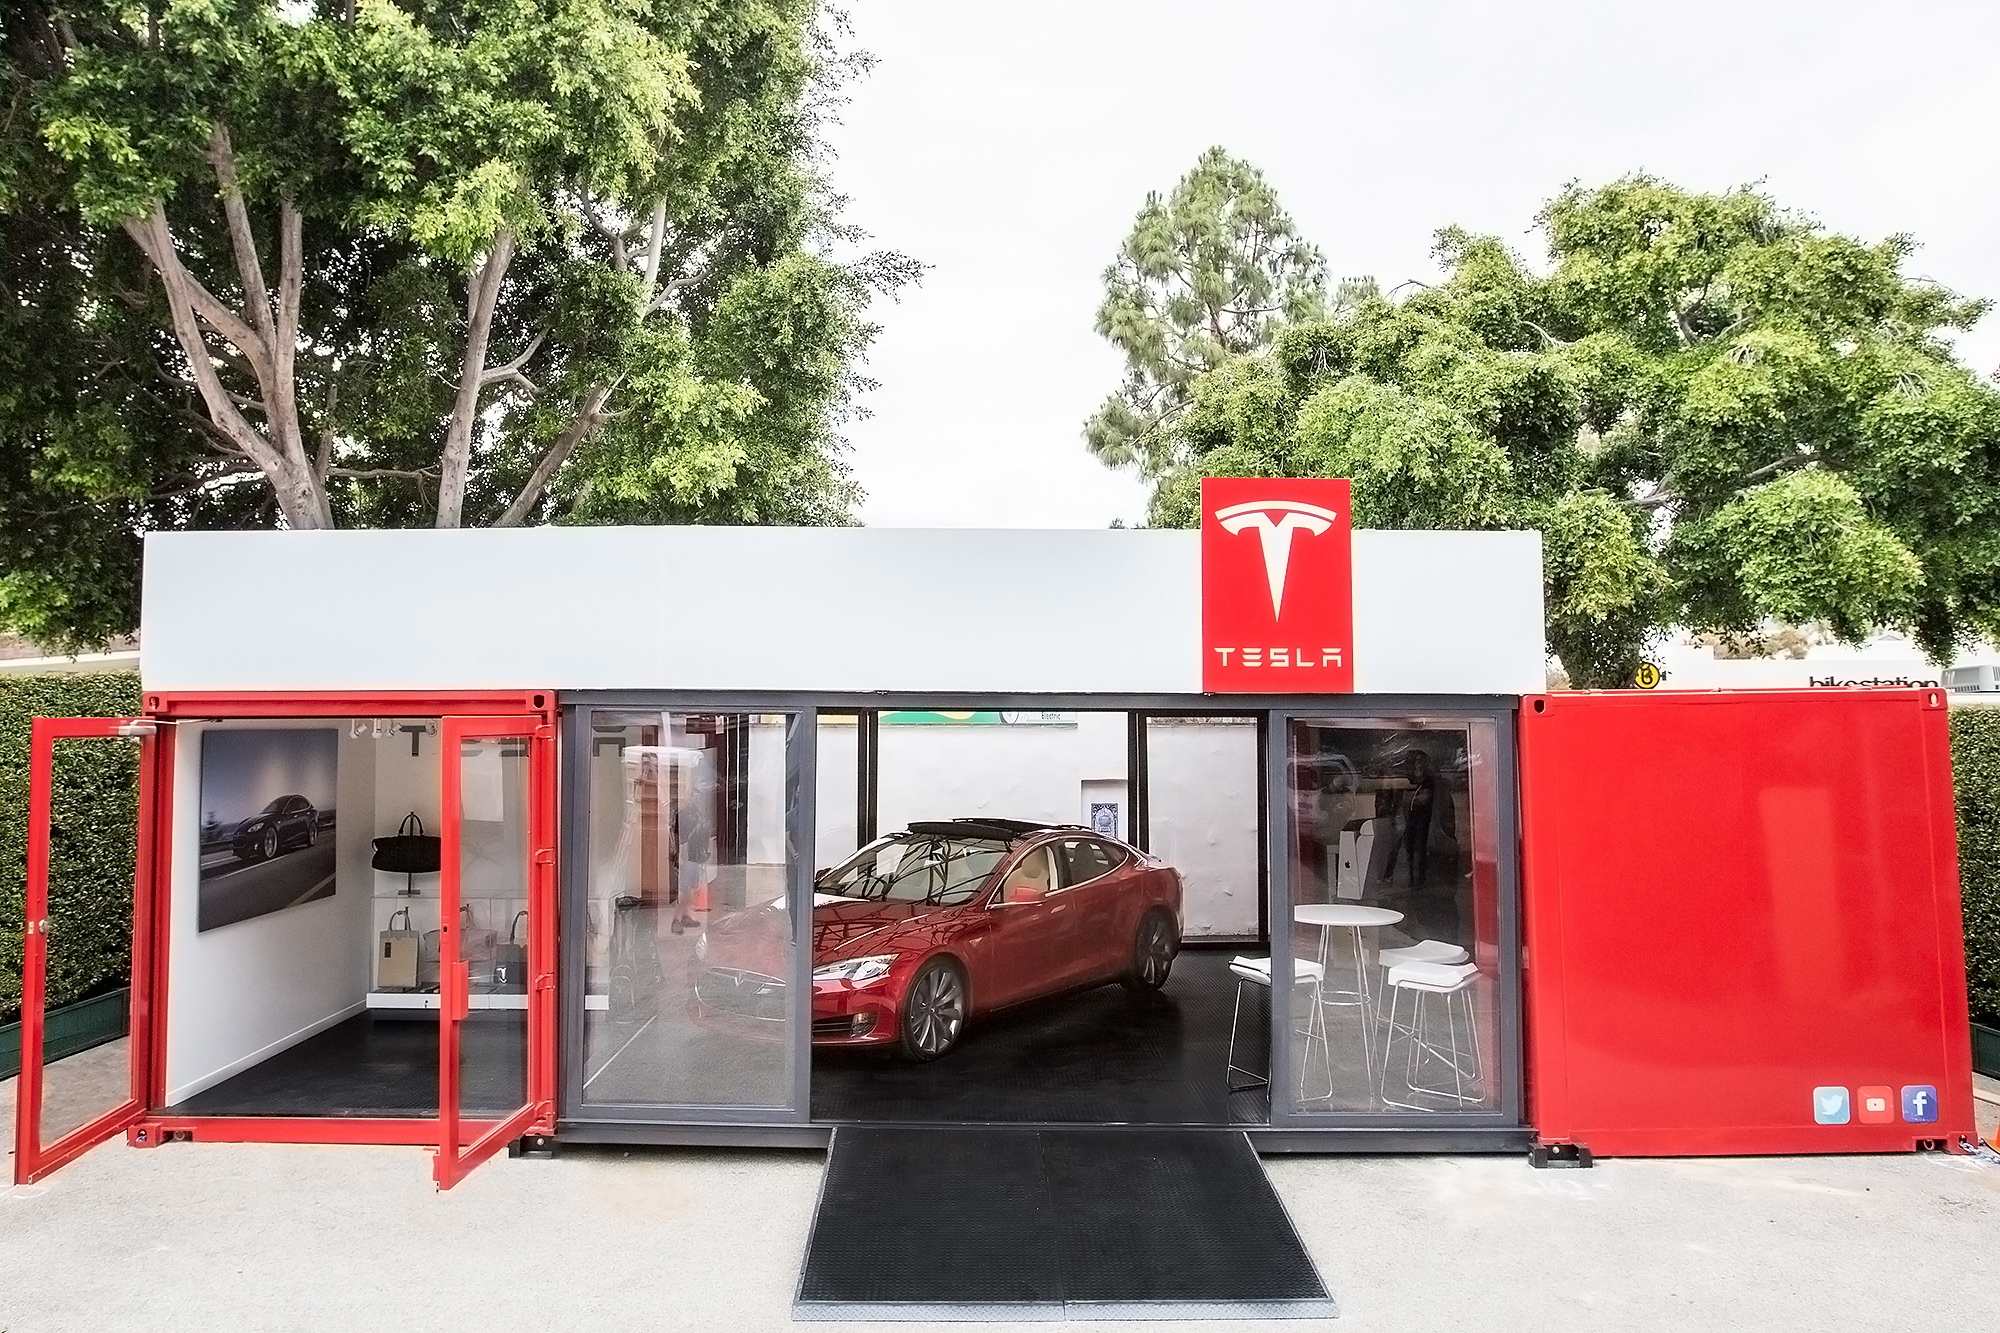 Tesla Motors hat im 2. Quartal 11.507 Exemplare des Elektroauto Tesla Model S ausgeliefert